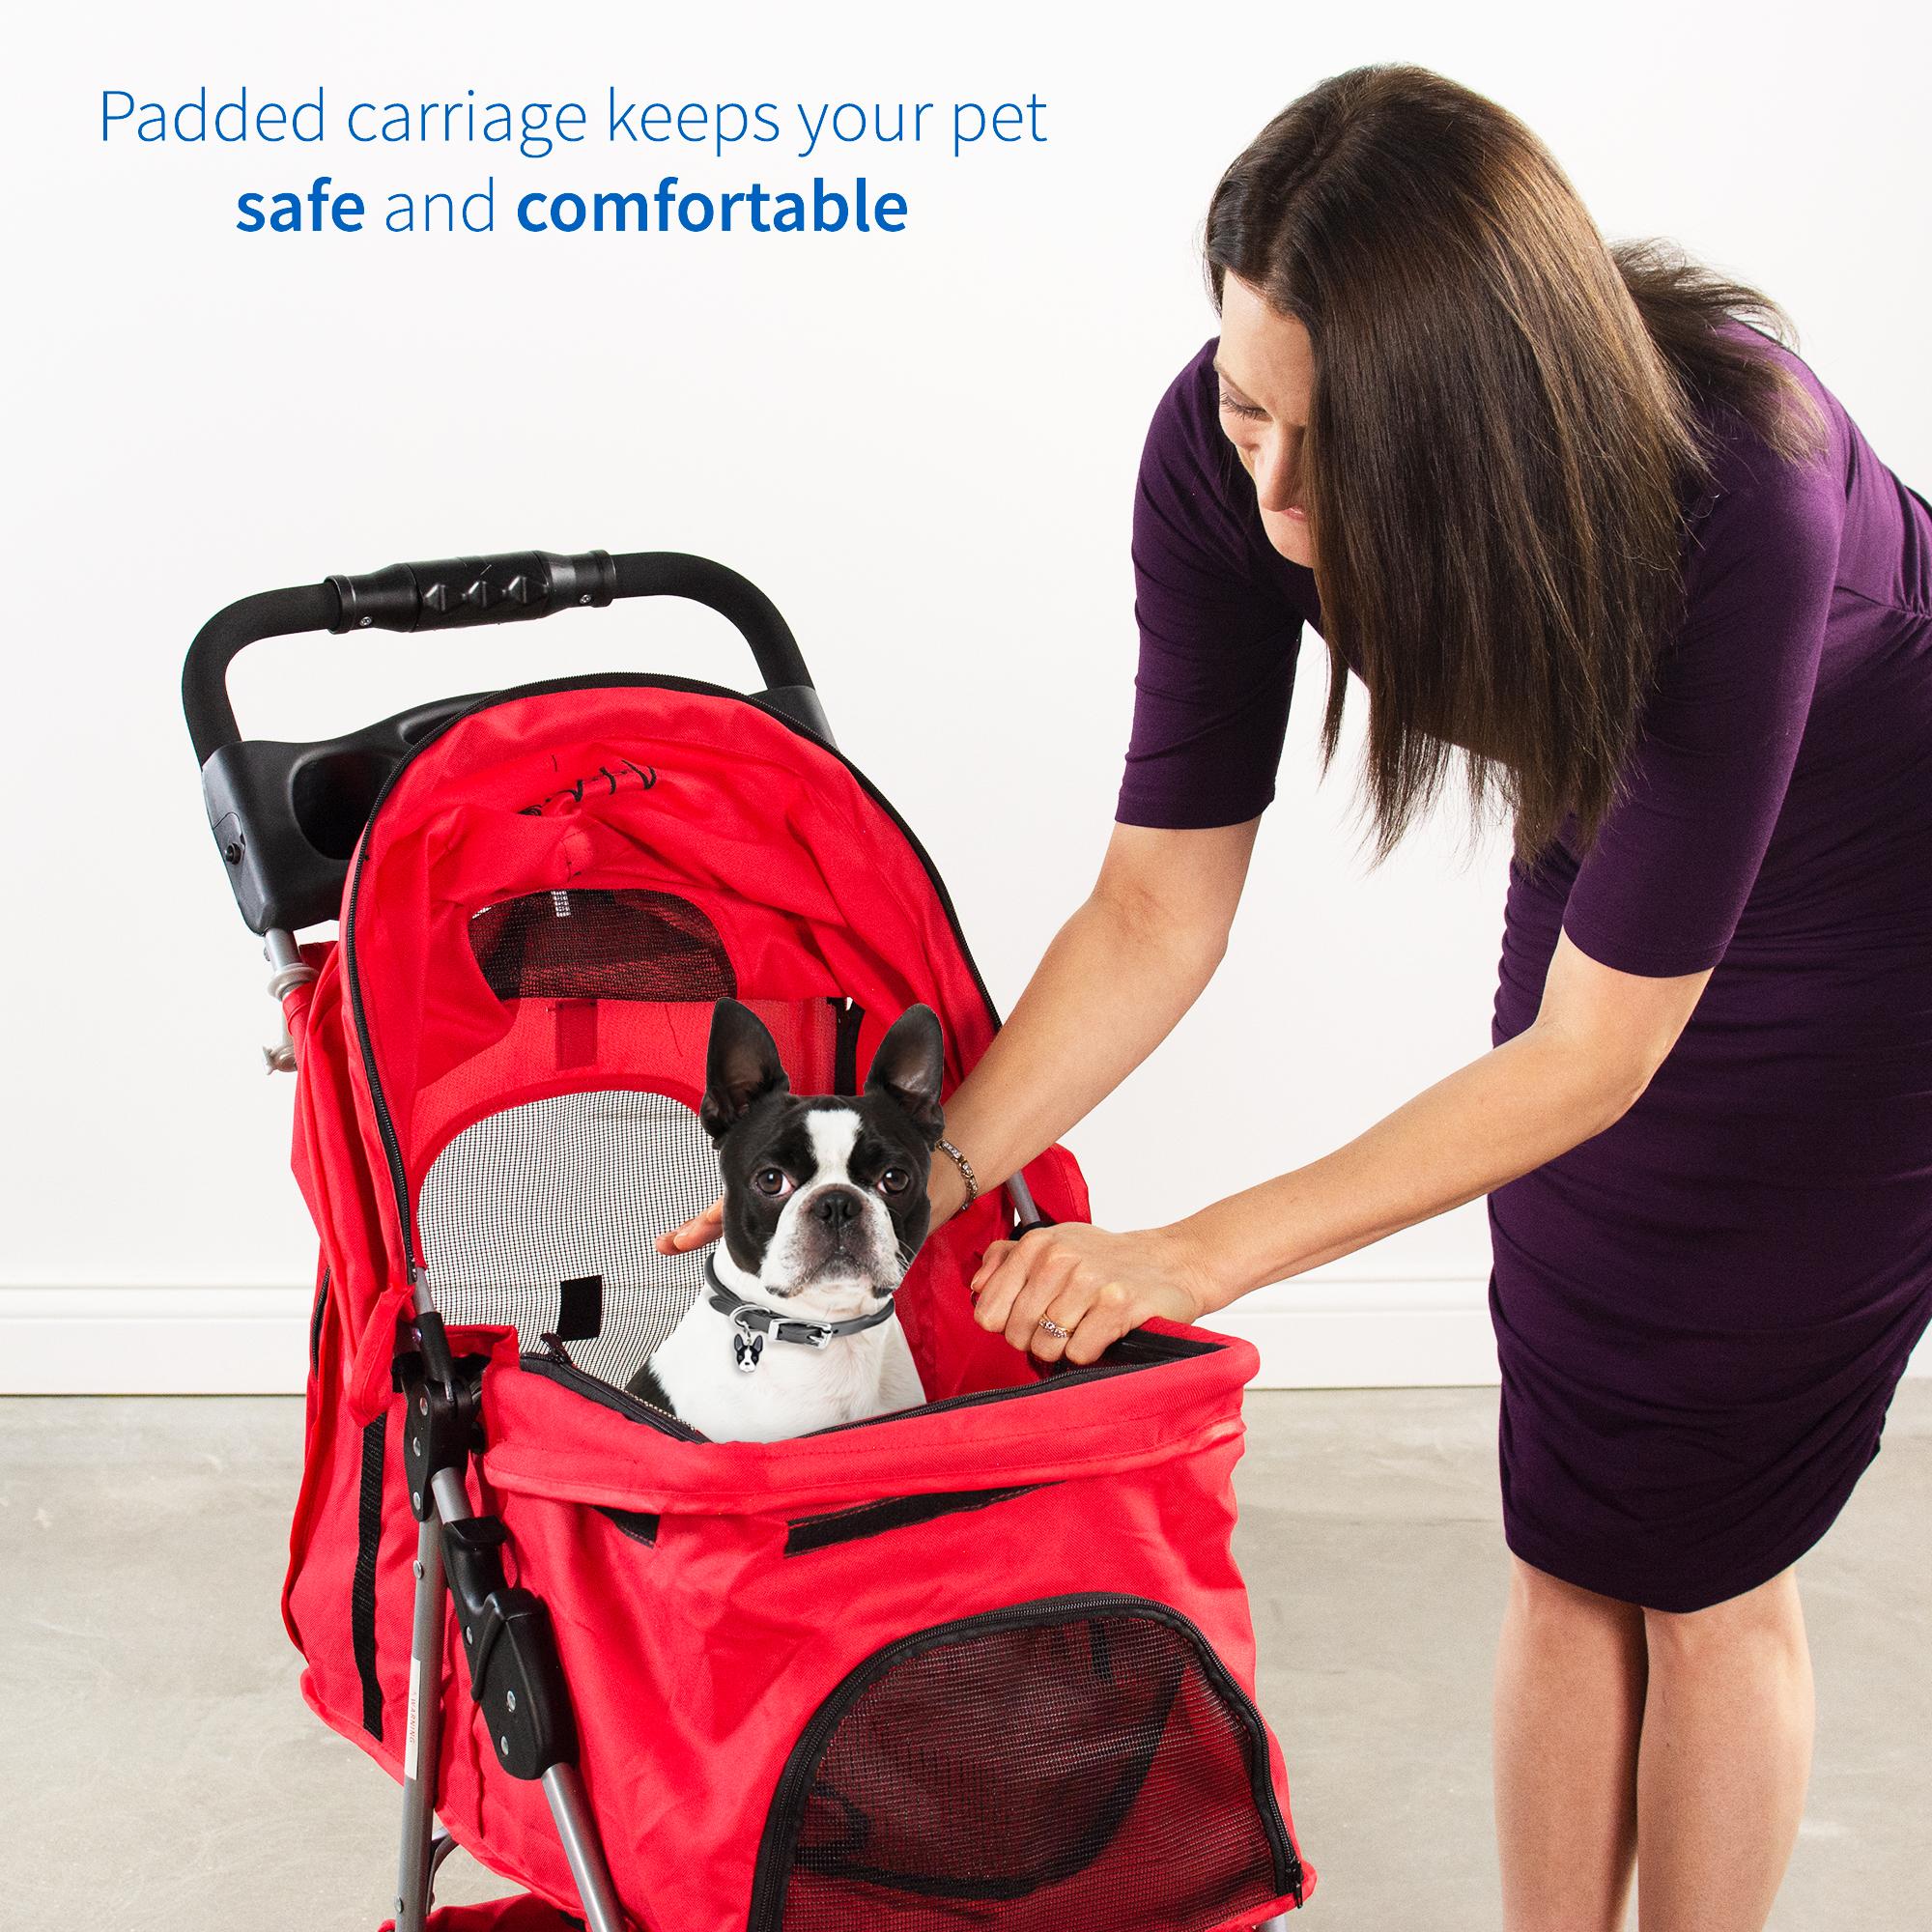 thumbnail 27 - VIVO Three Wheel Pet Stroller / Cat & Dog Foldable Carrier Strolling Cart